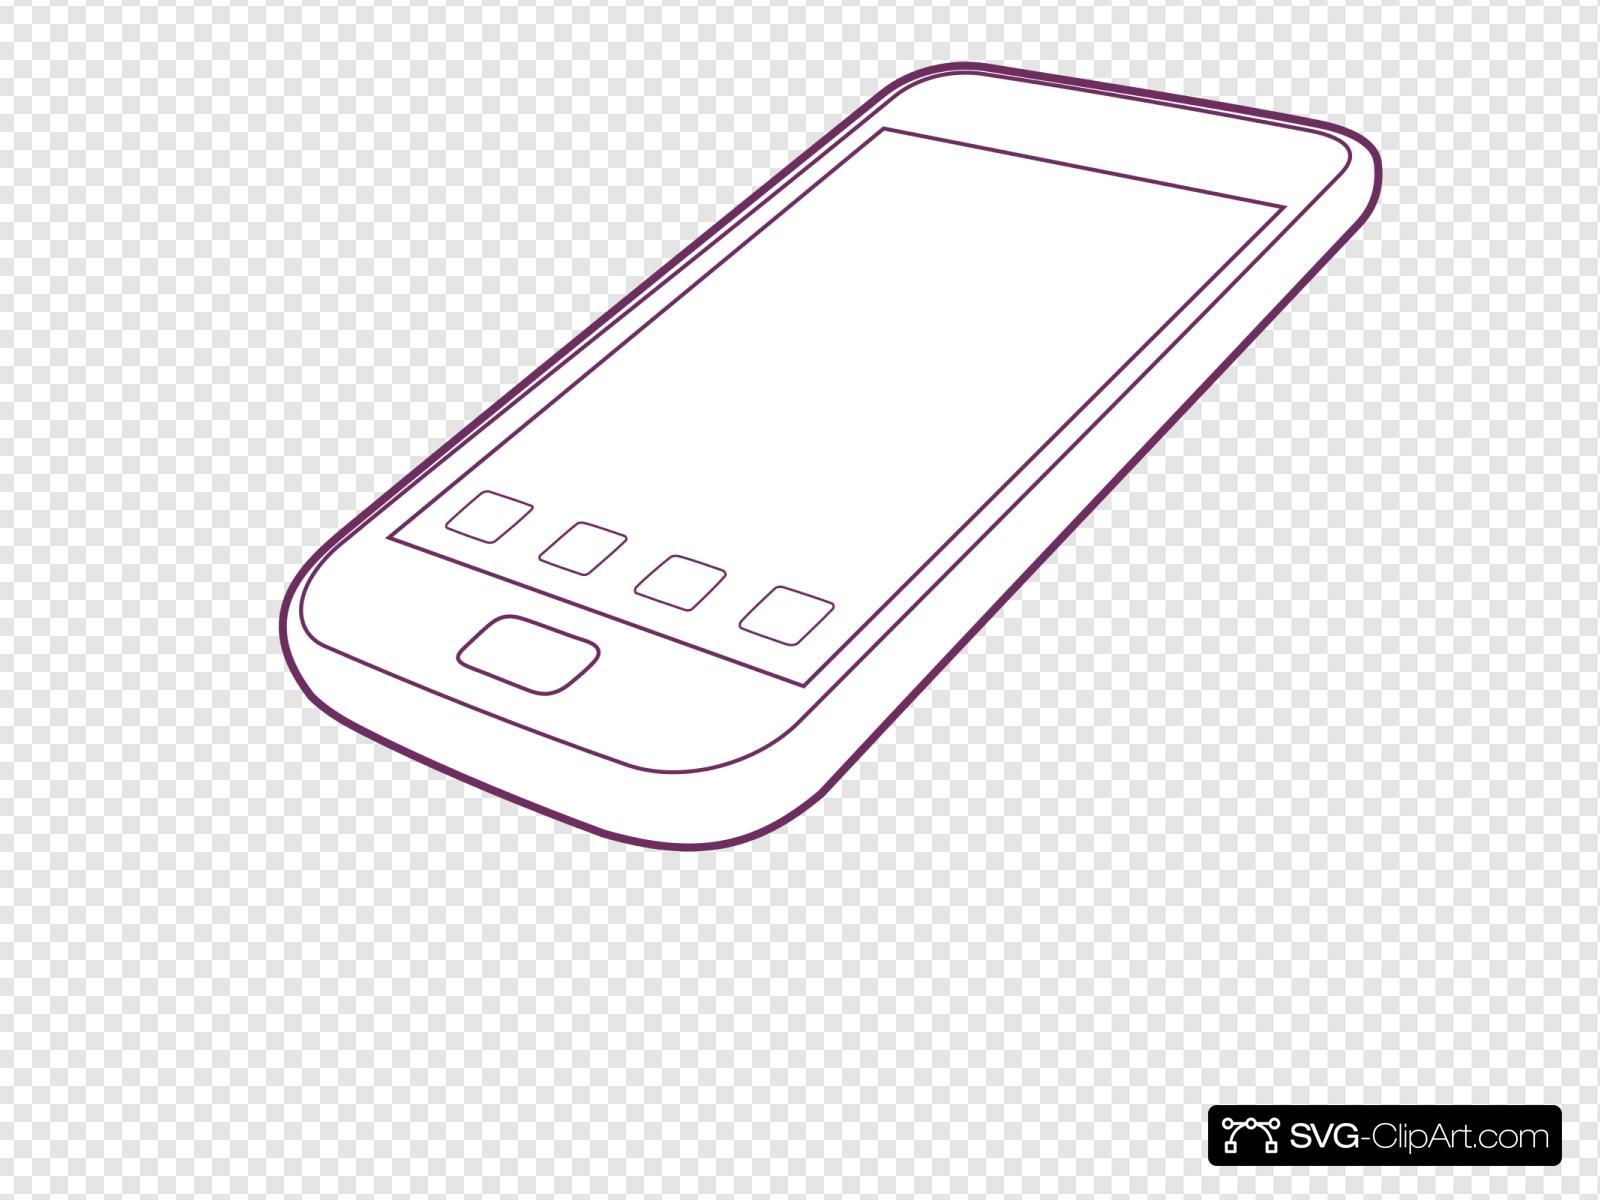 Phone outline. Purple clip art icon